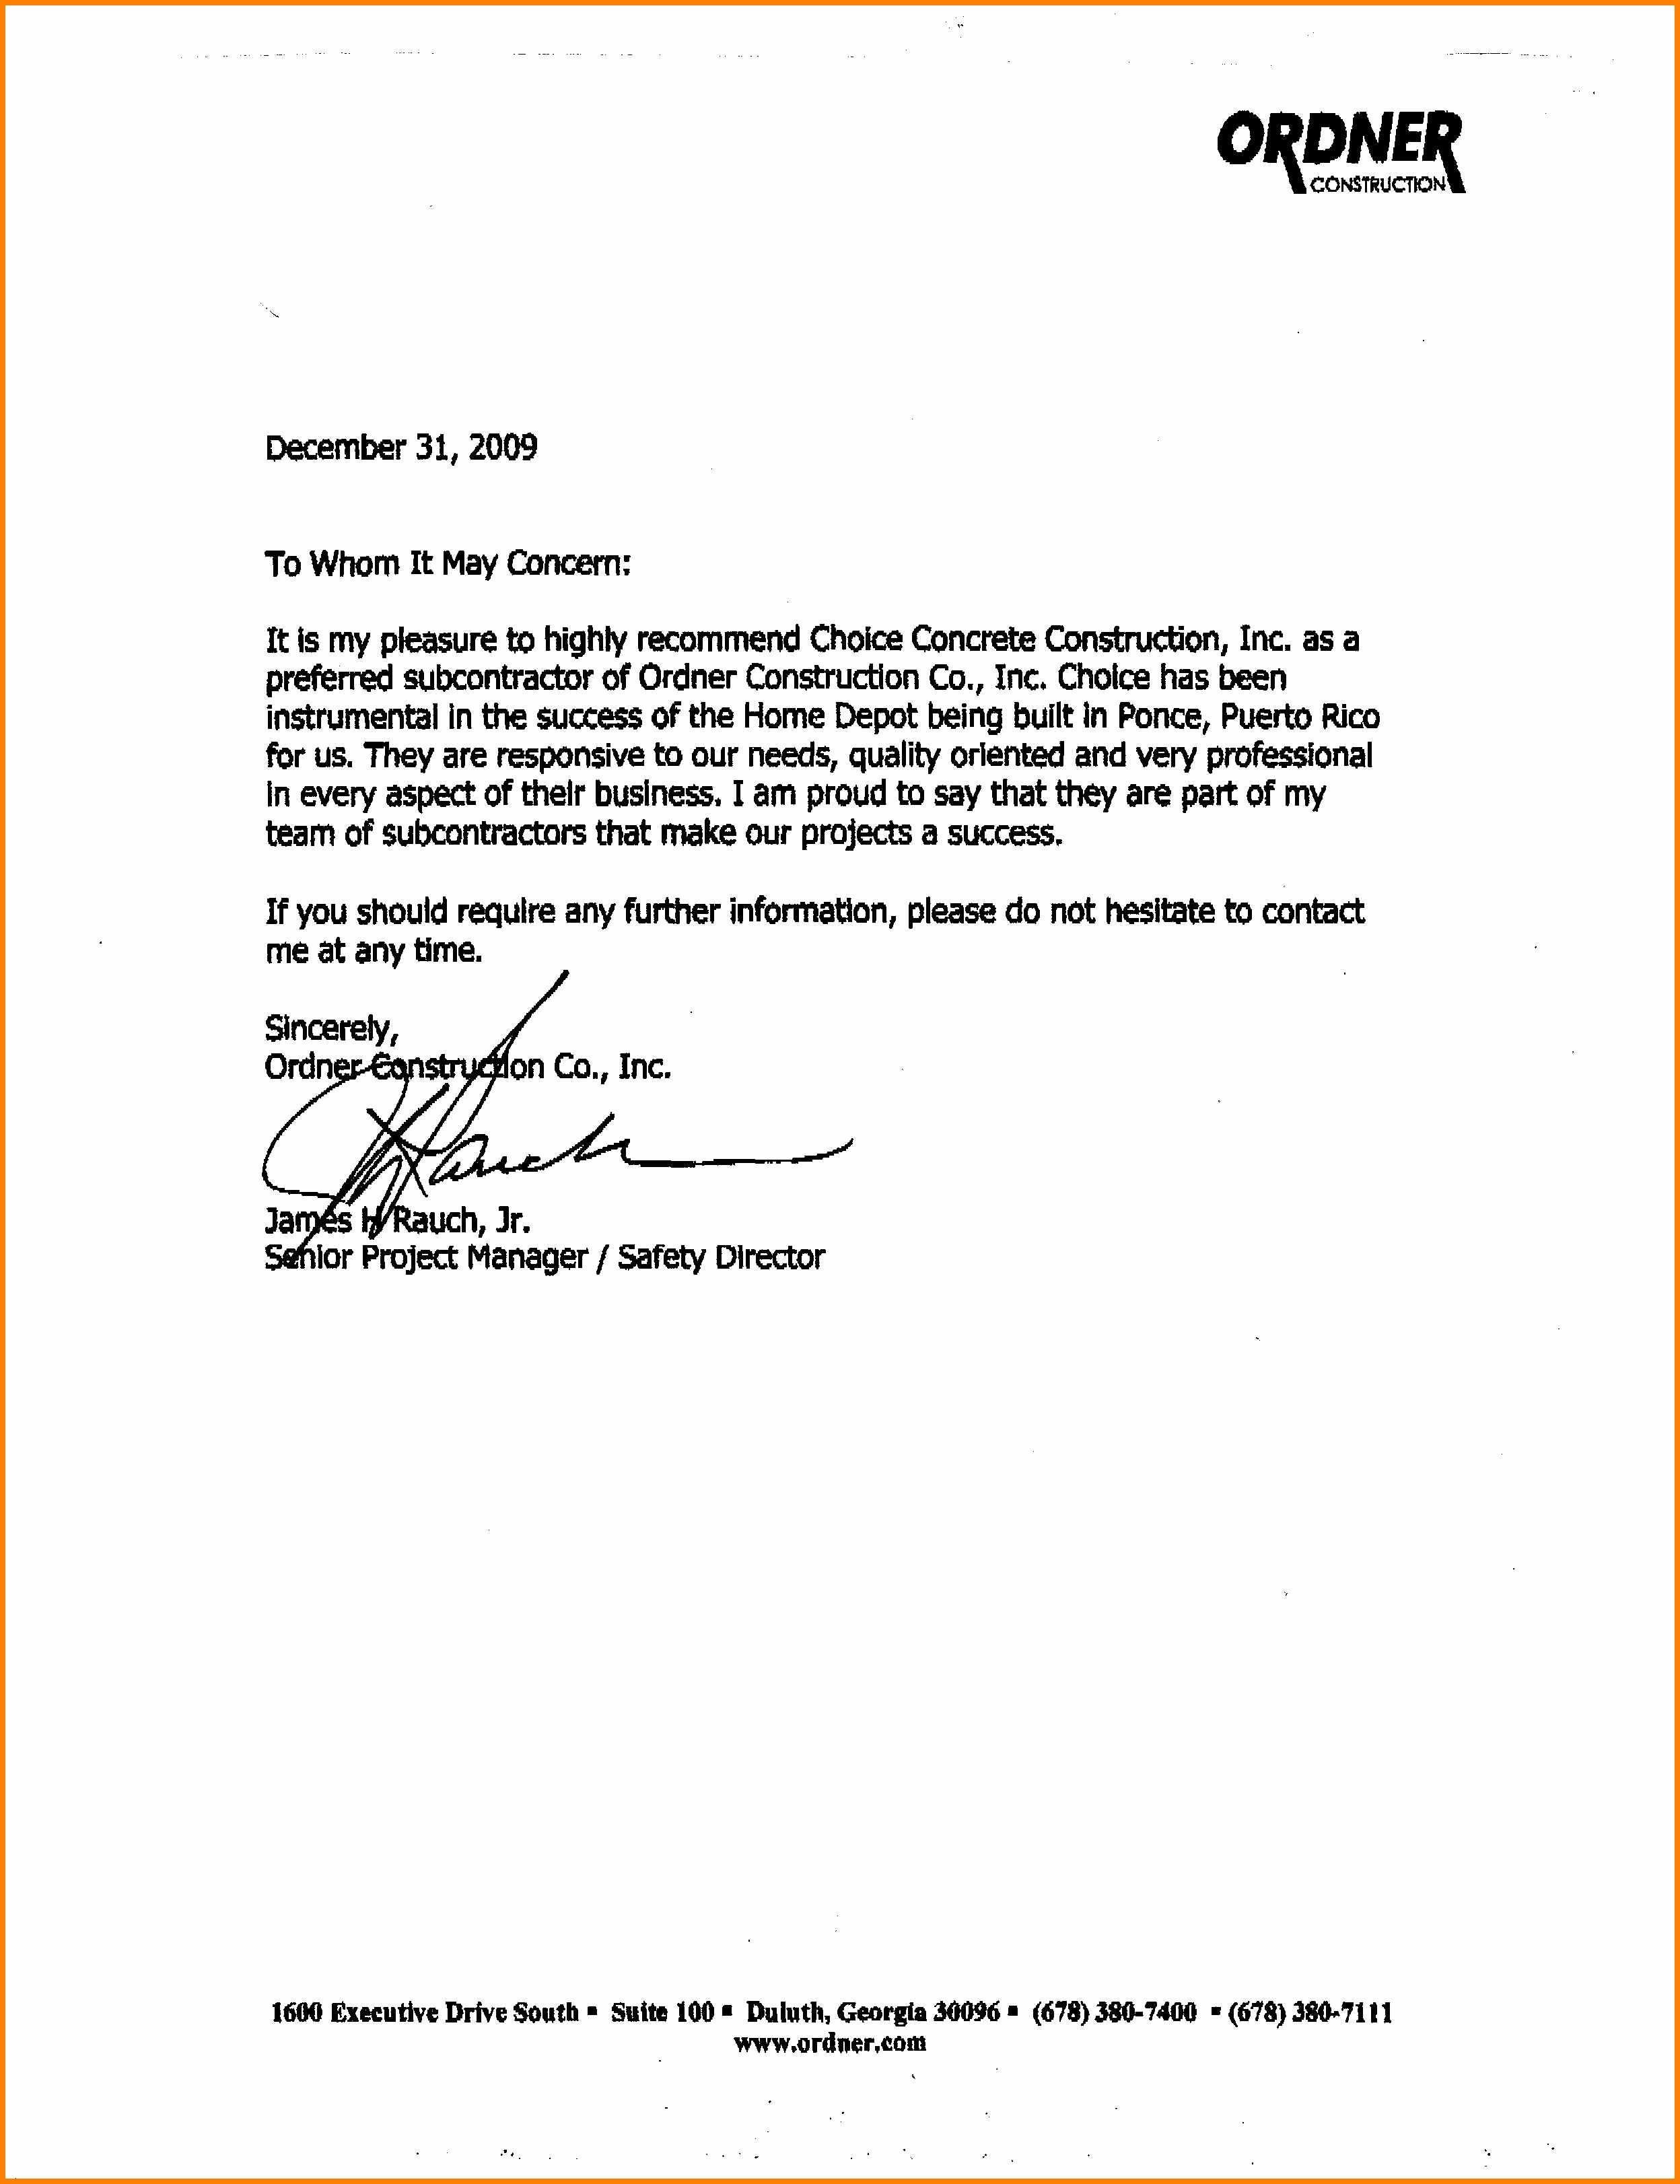 Fresh General Letter Of Recommendation Sample Download Https Letterbuis Com Fresh General Letter Of Recom Letter Of Recommendation Lettering Reference Letter General letter of recommendation template